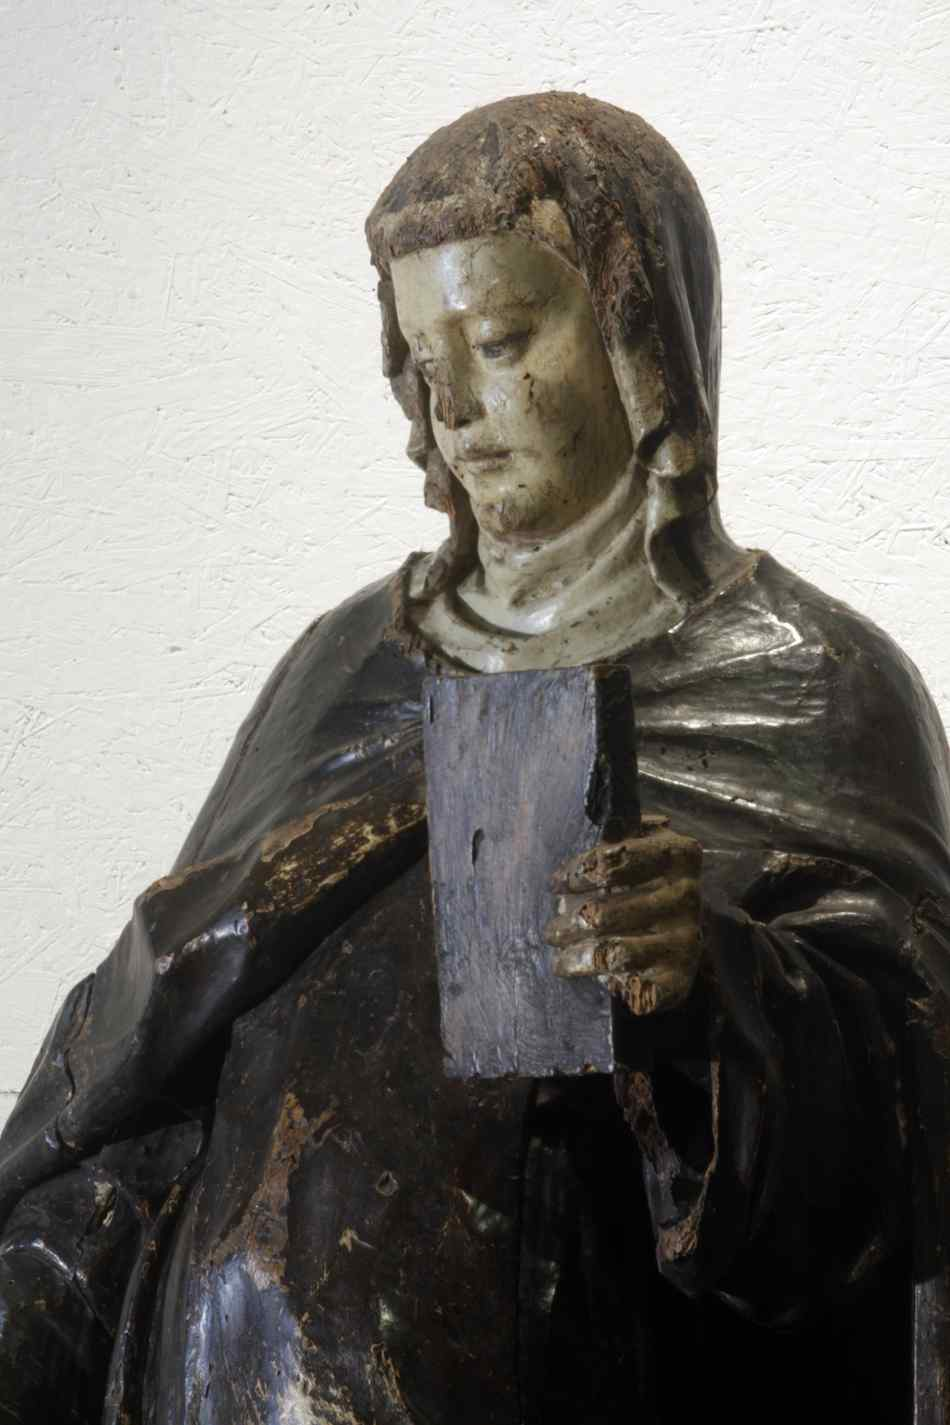 Wooden sculpture, Santa Caterina, Siena, 15th century